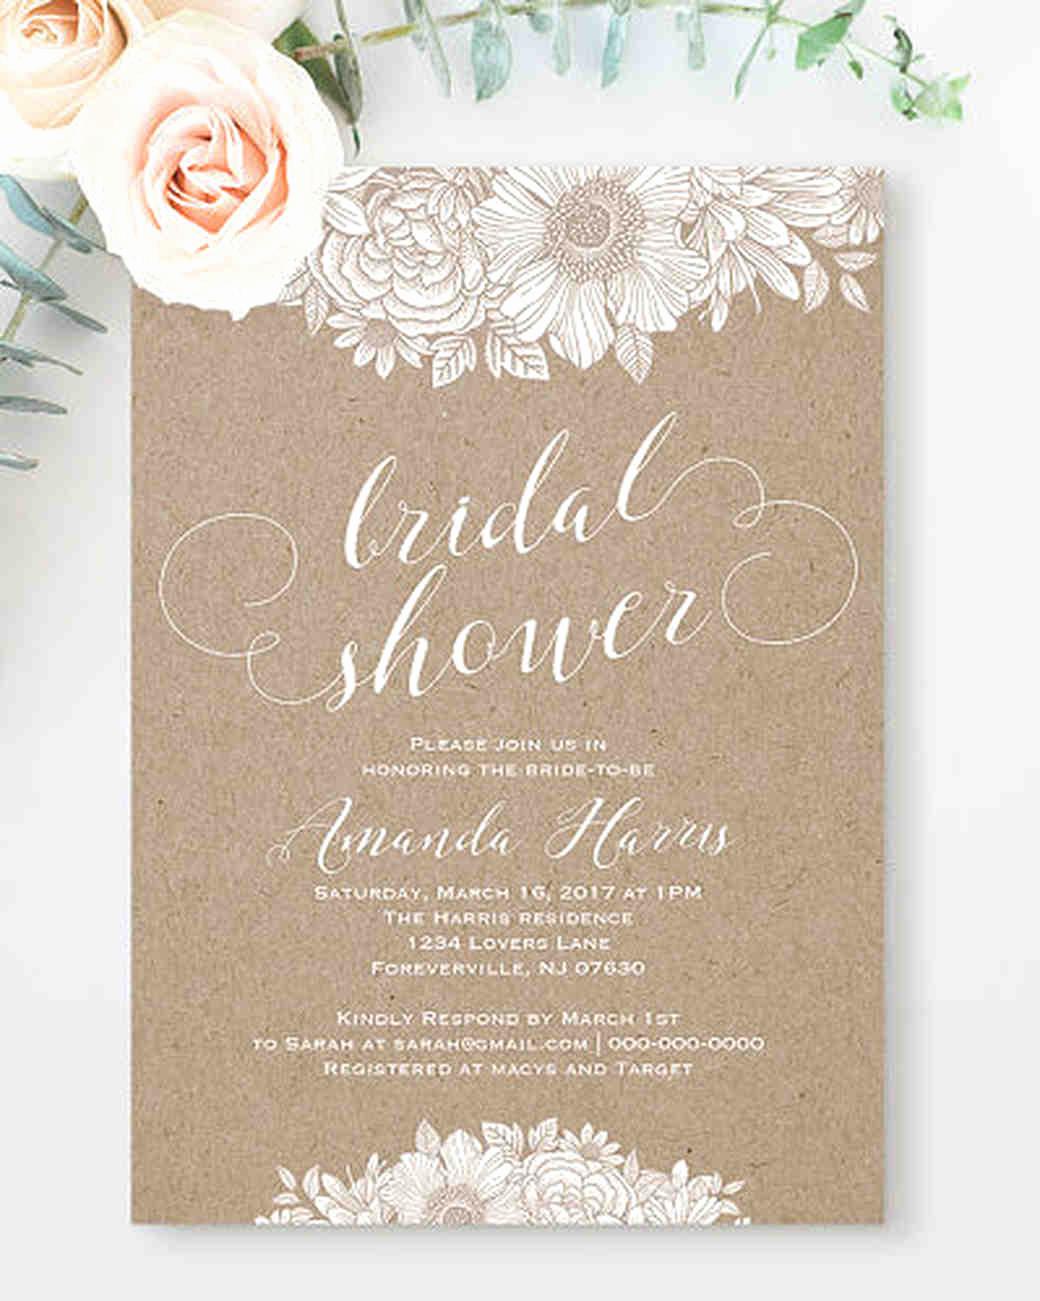 Free Printable Bridal Shower Invitations Lovely 10 Affordable Bridal Shower Invitations You Can Print at